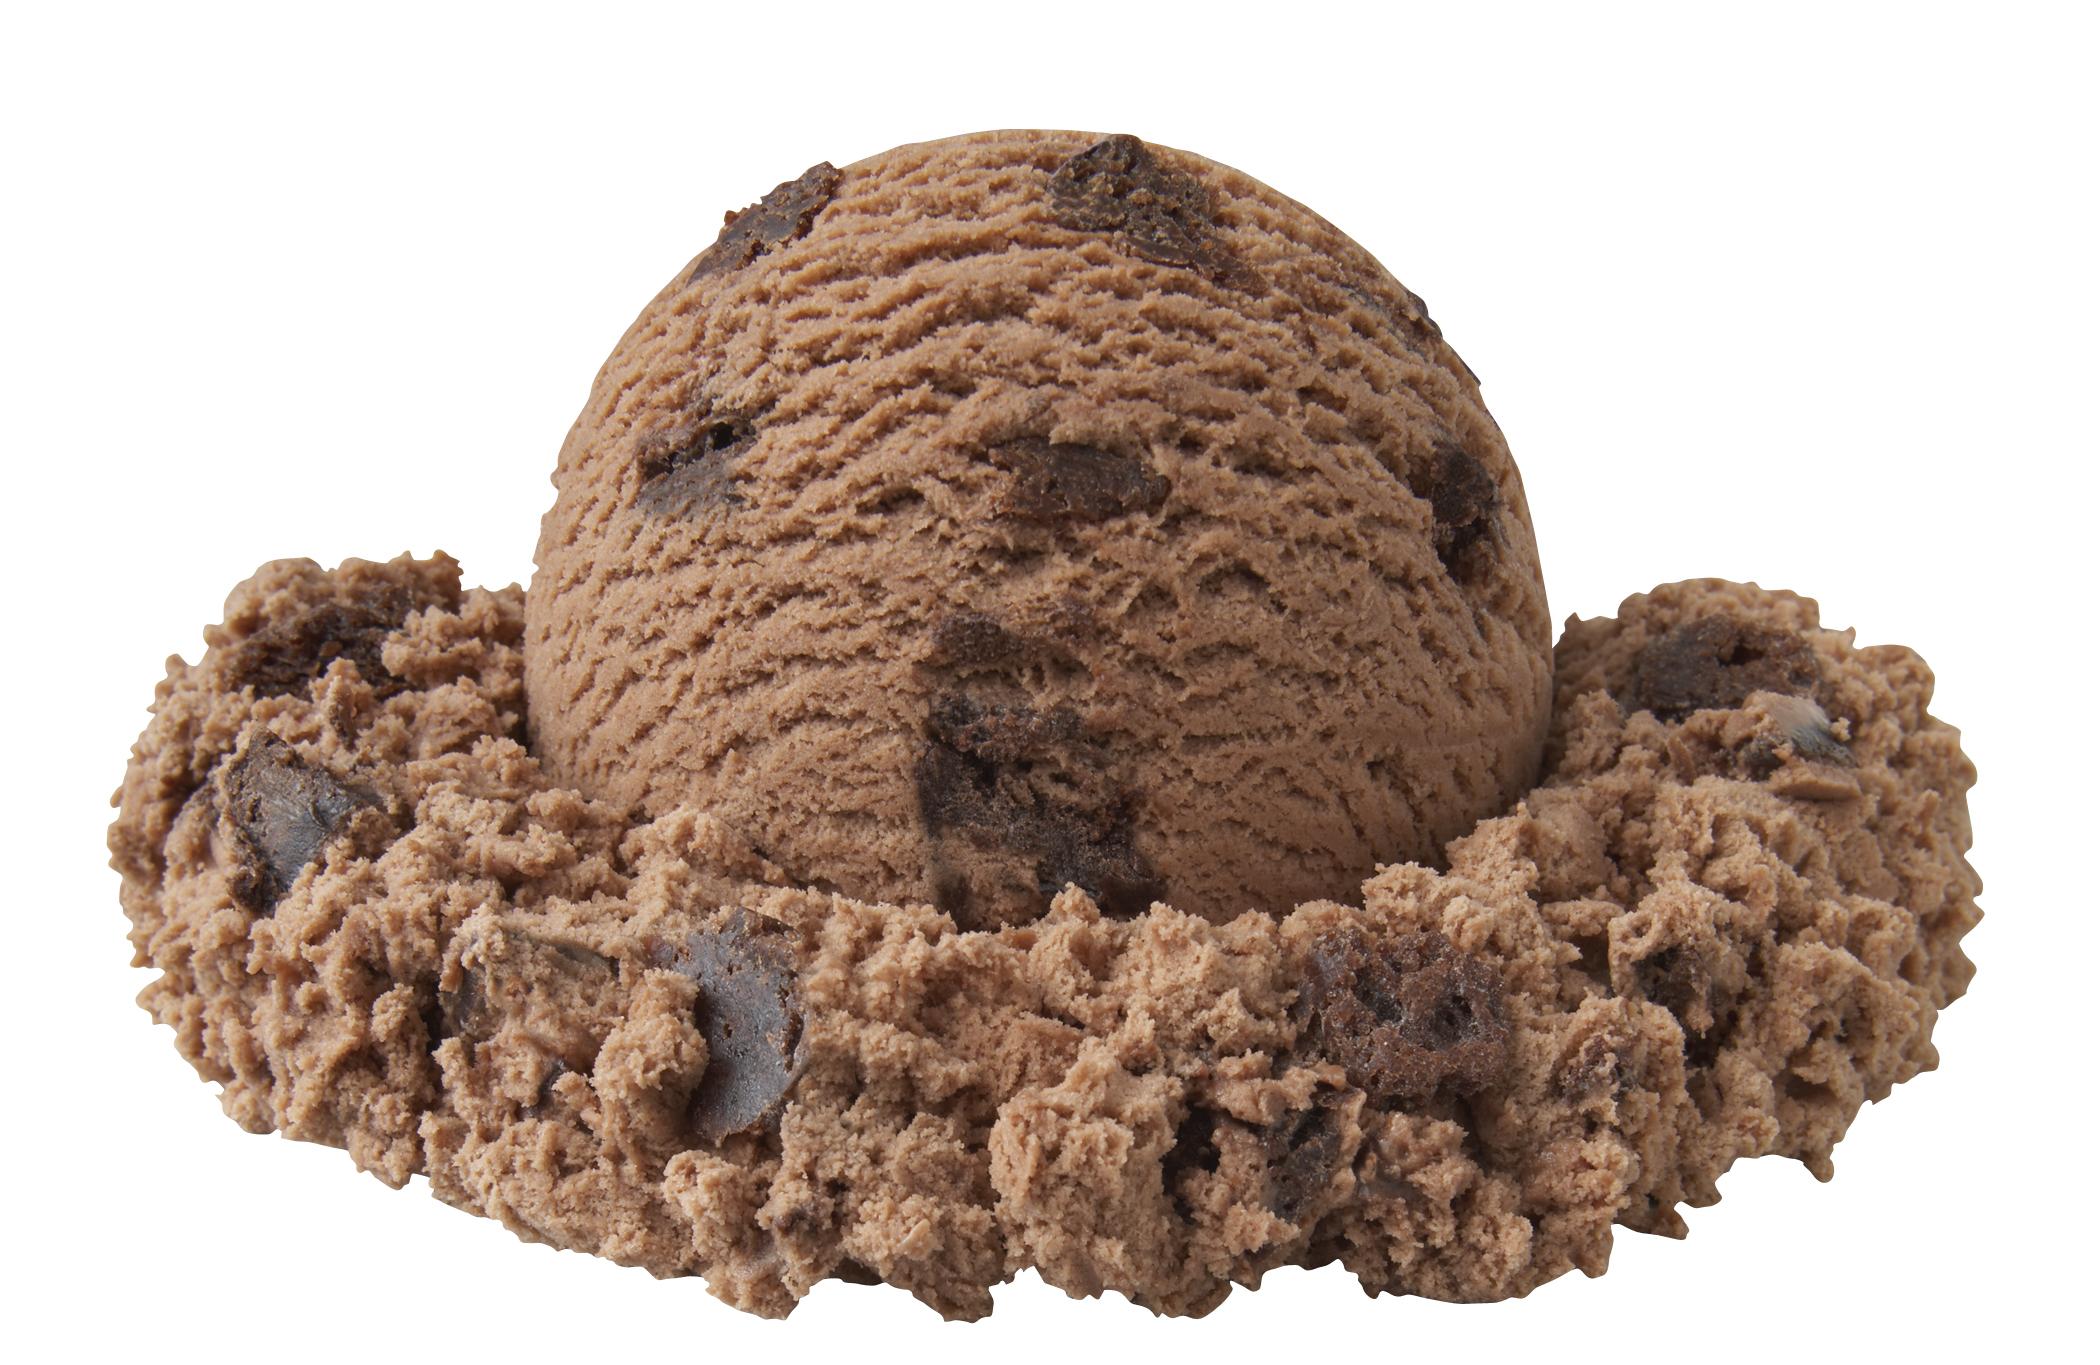 Chocolate Fudge Brownie Ice Cream